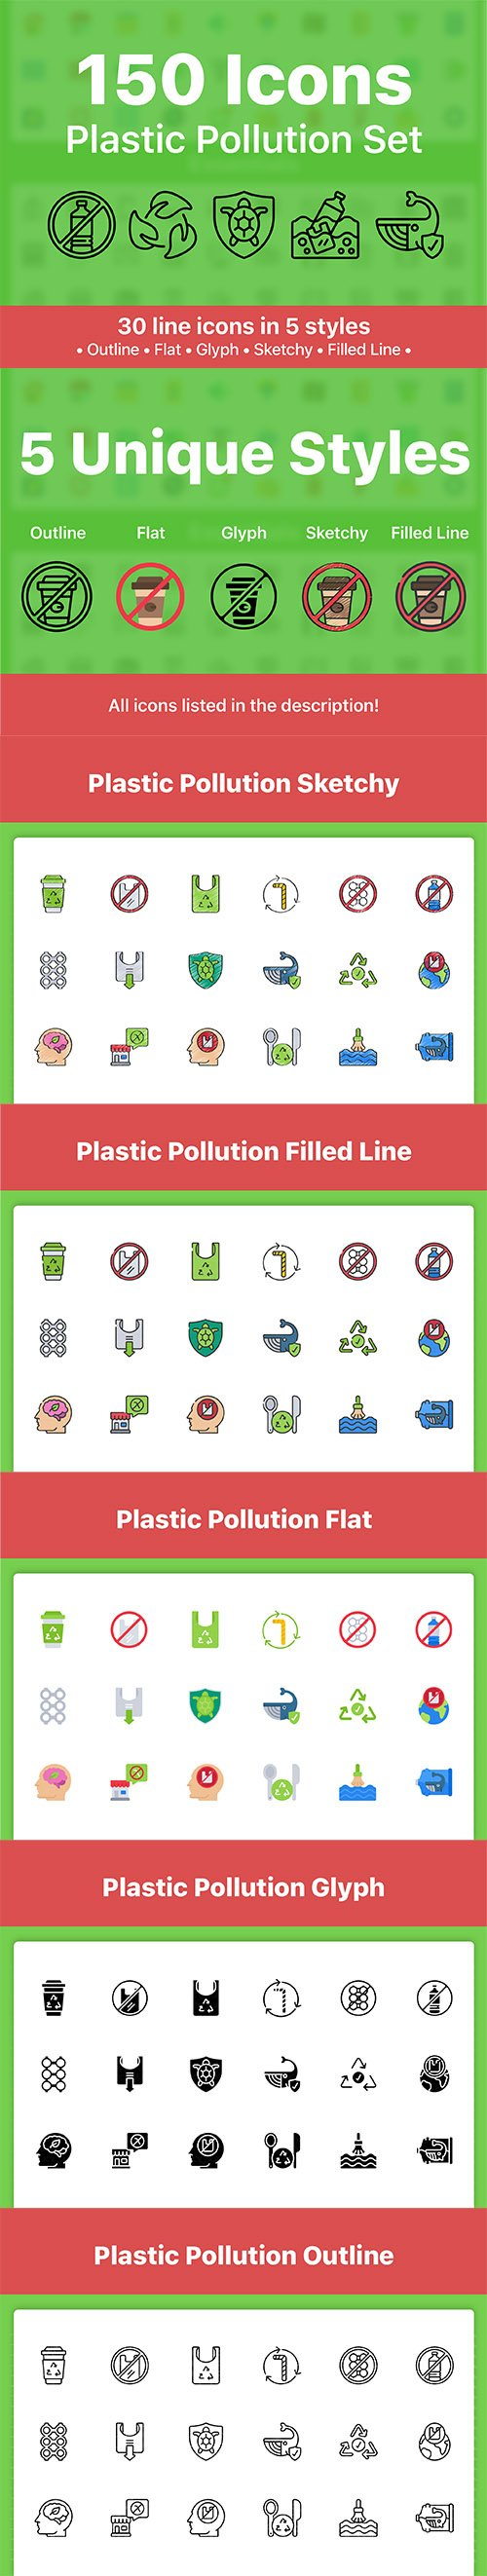 150 Plastic Pollution Icons